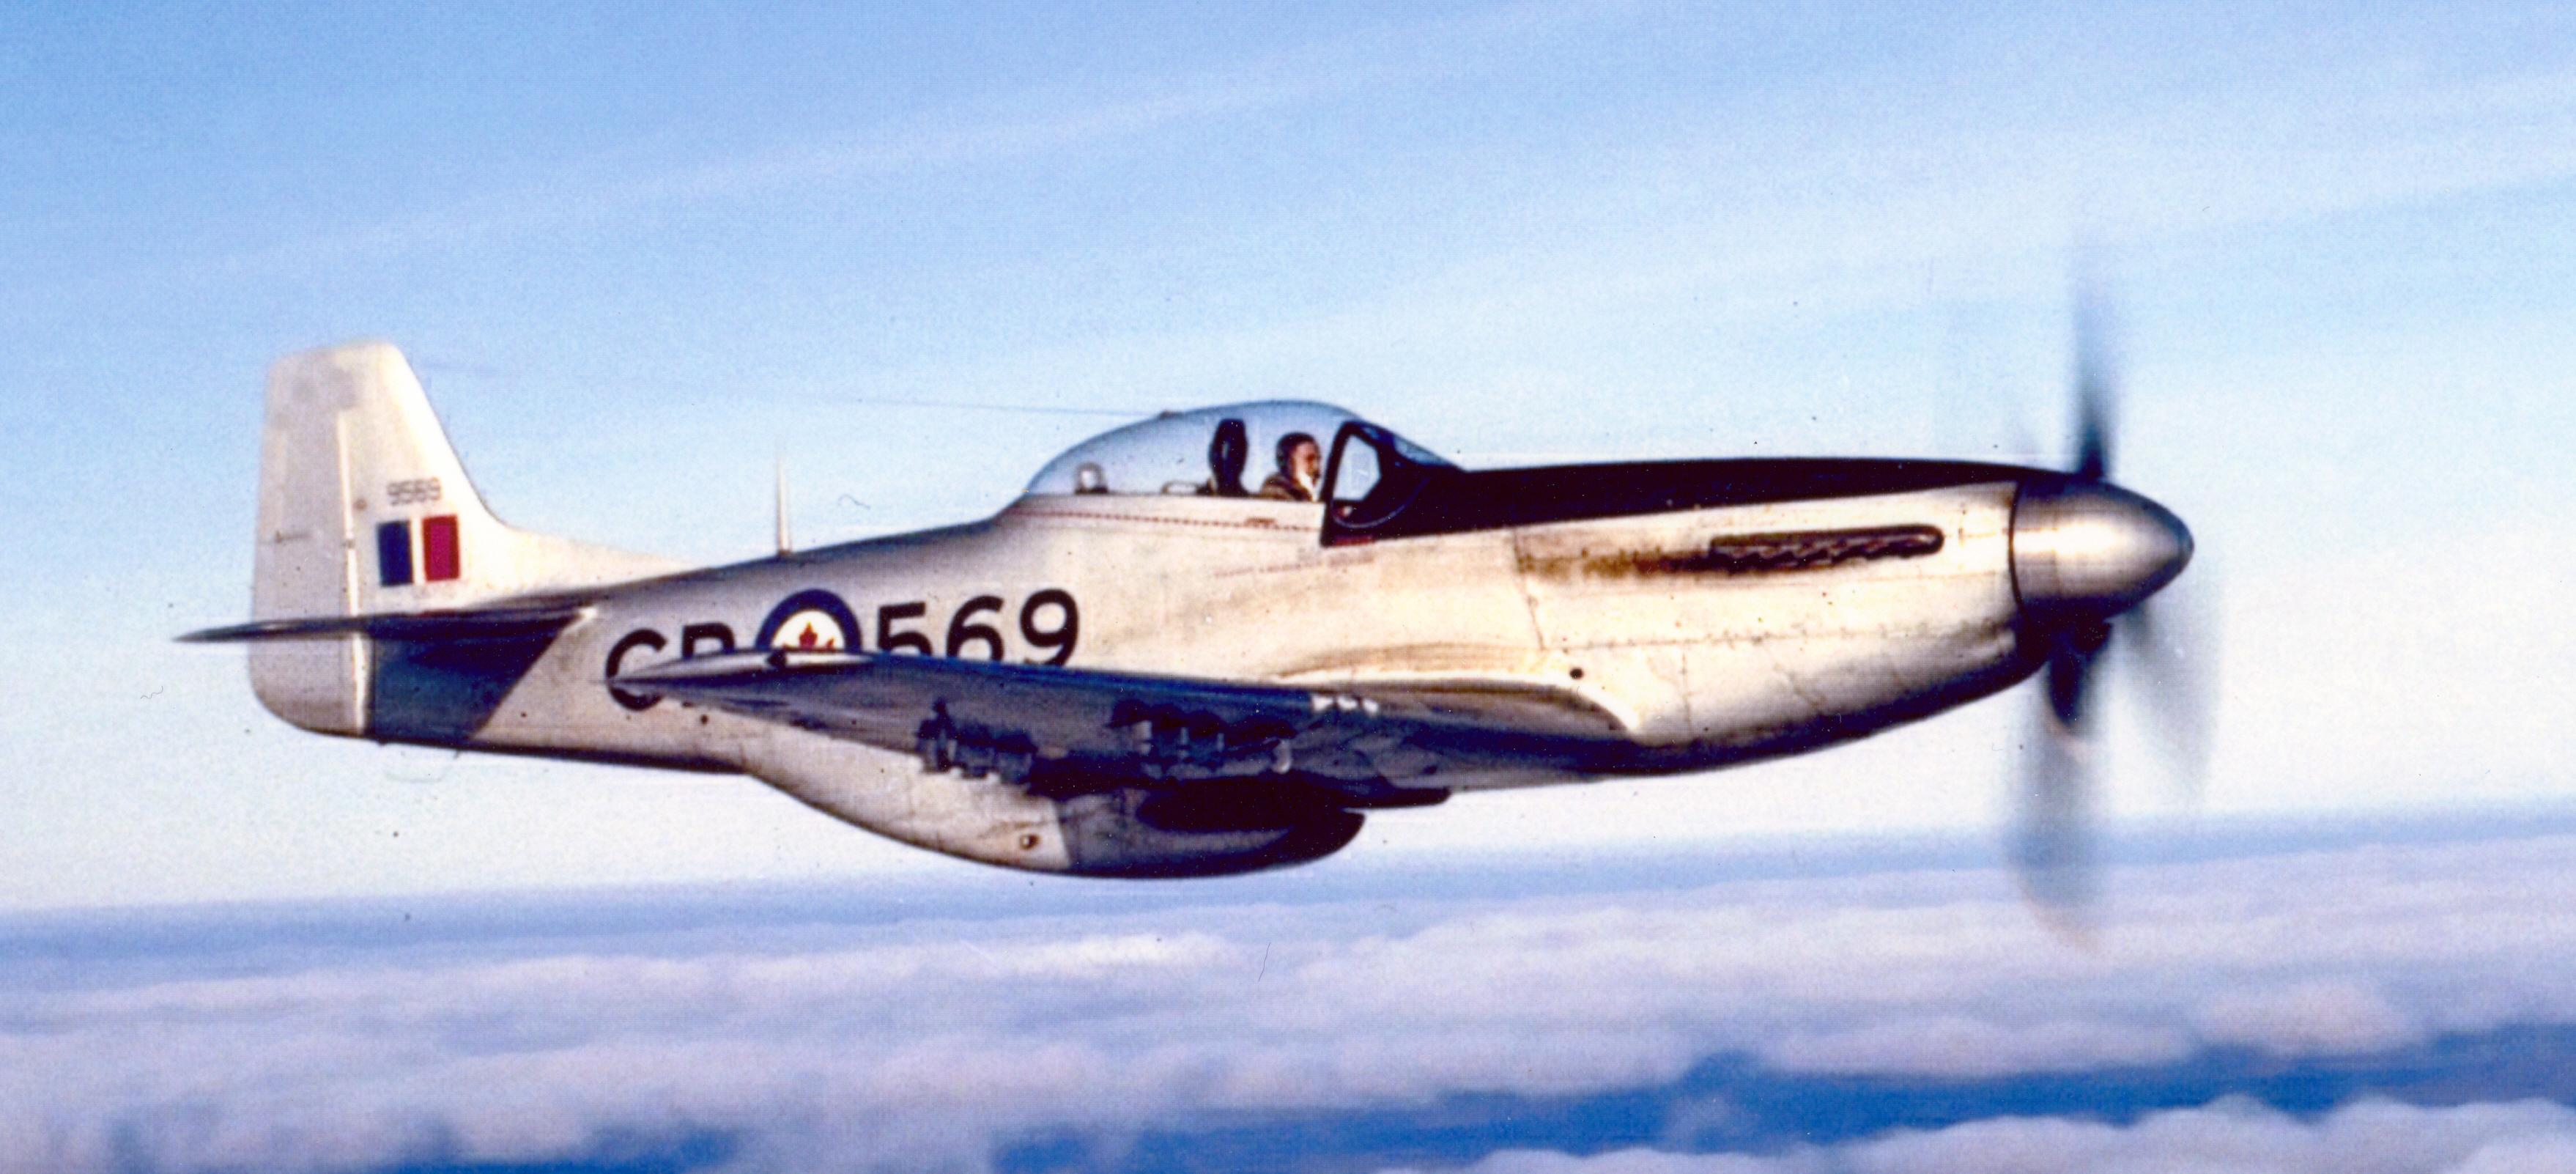 P 51 on Transparent Fighter Plane